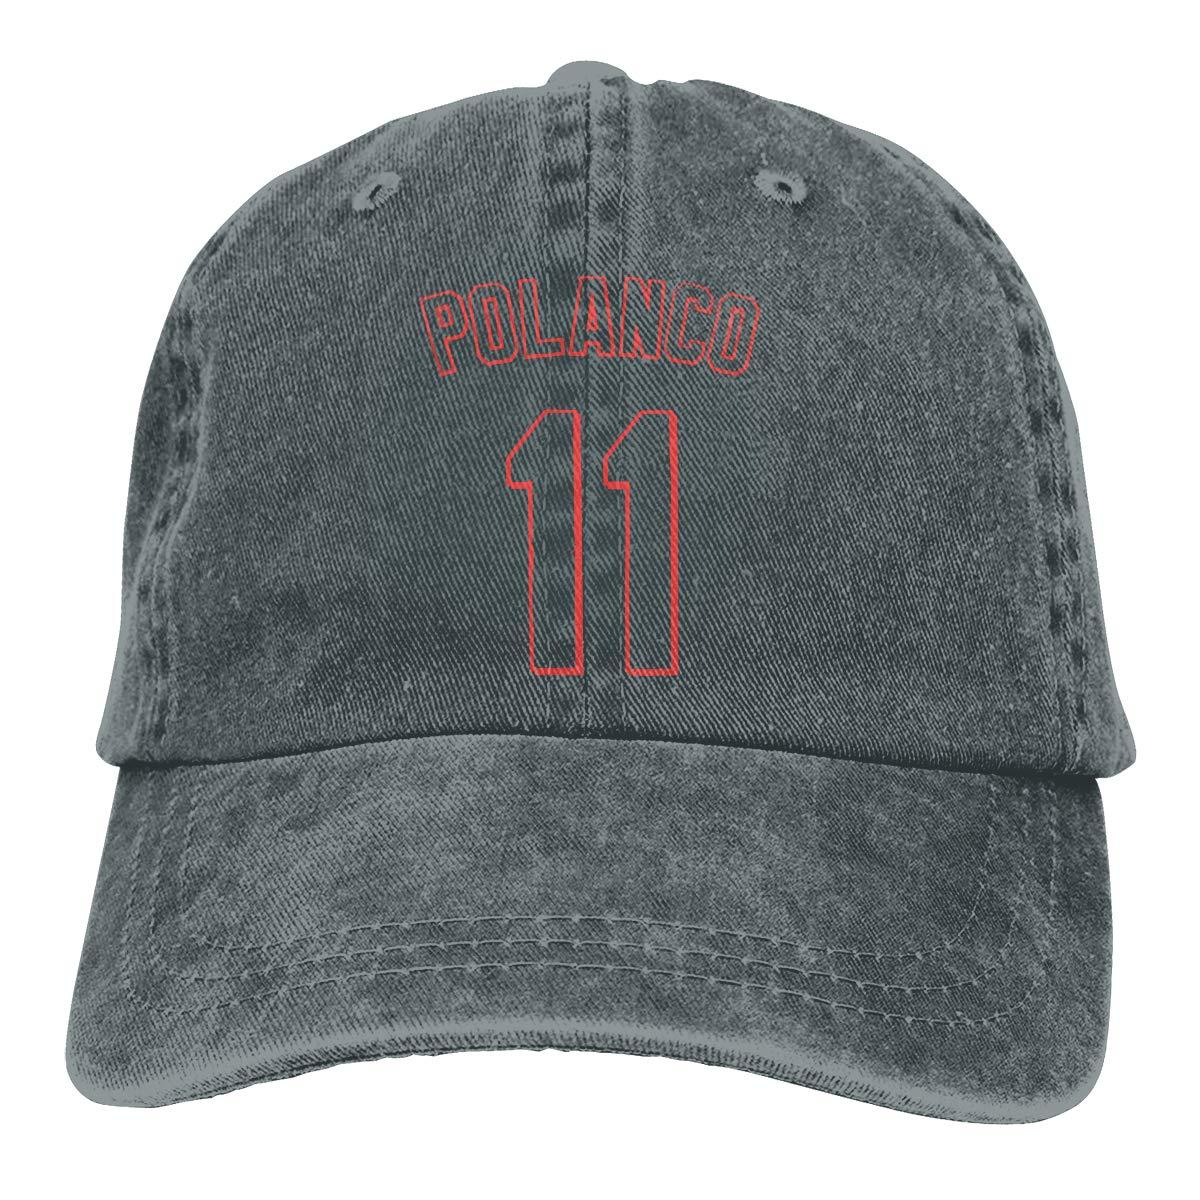 DeniCar Unisex Adjustable Baseball Caps Jorge-Polanco-No-11 Cowboy Skull Cap